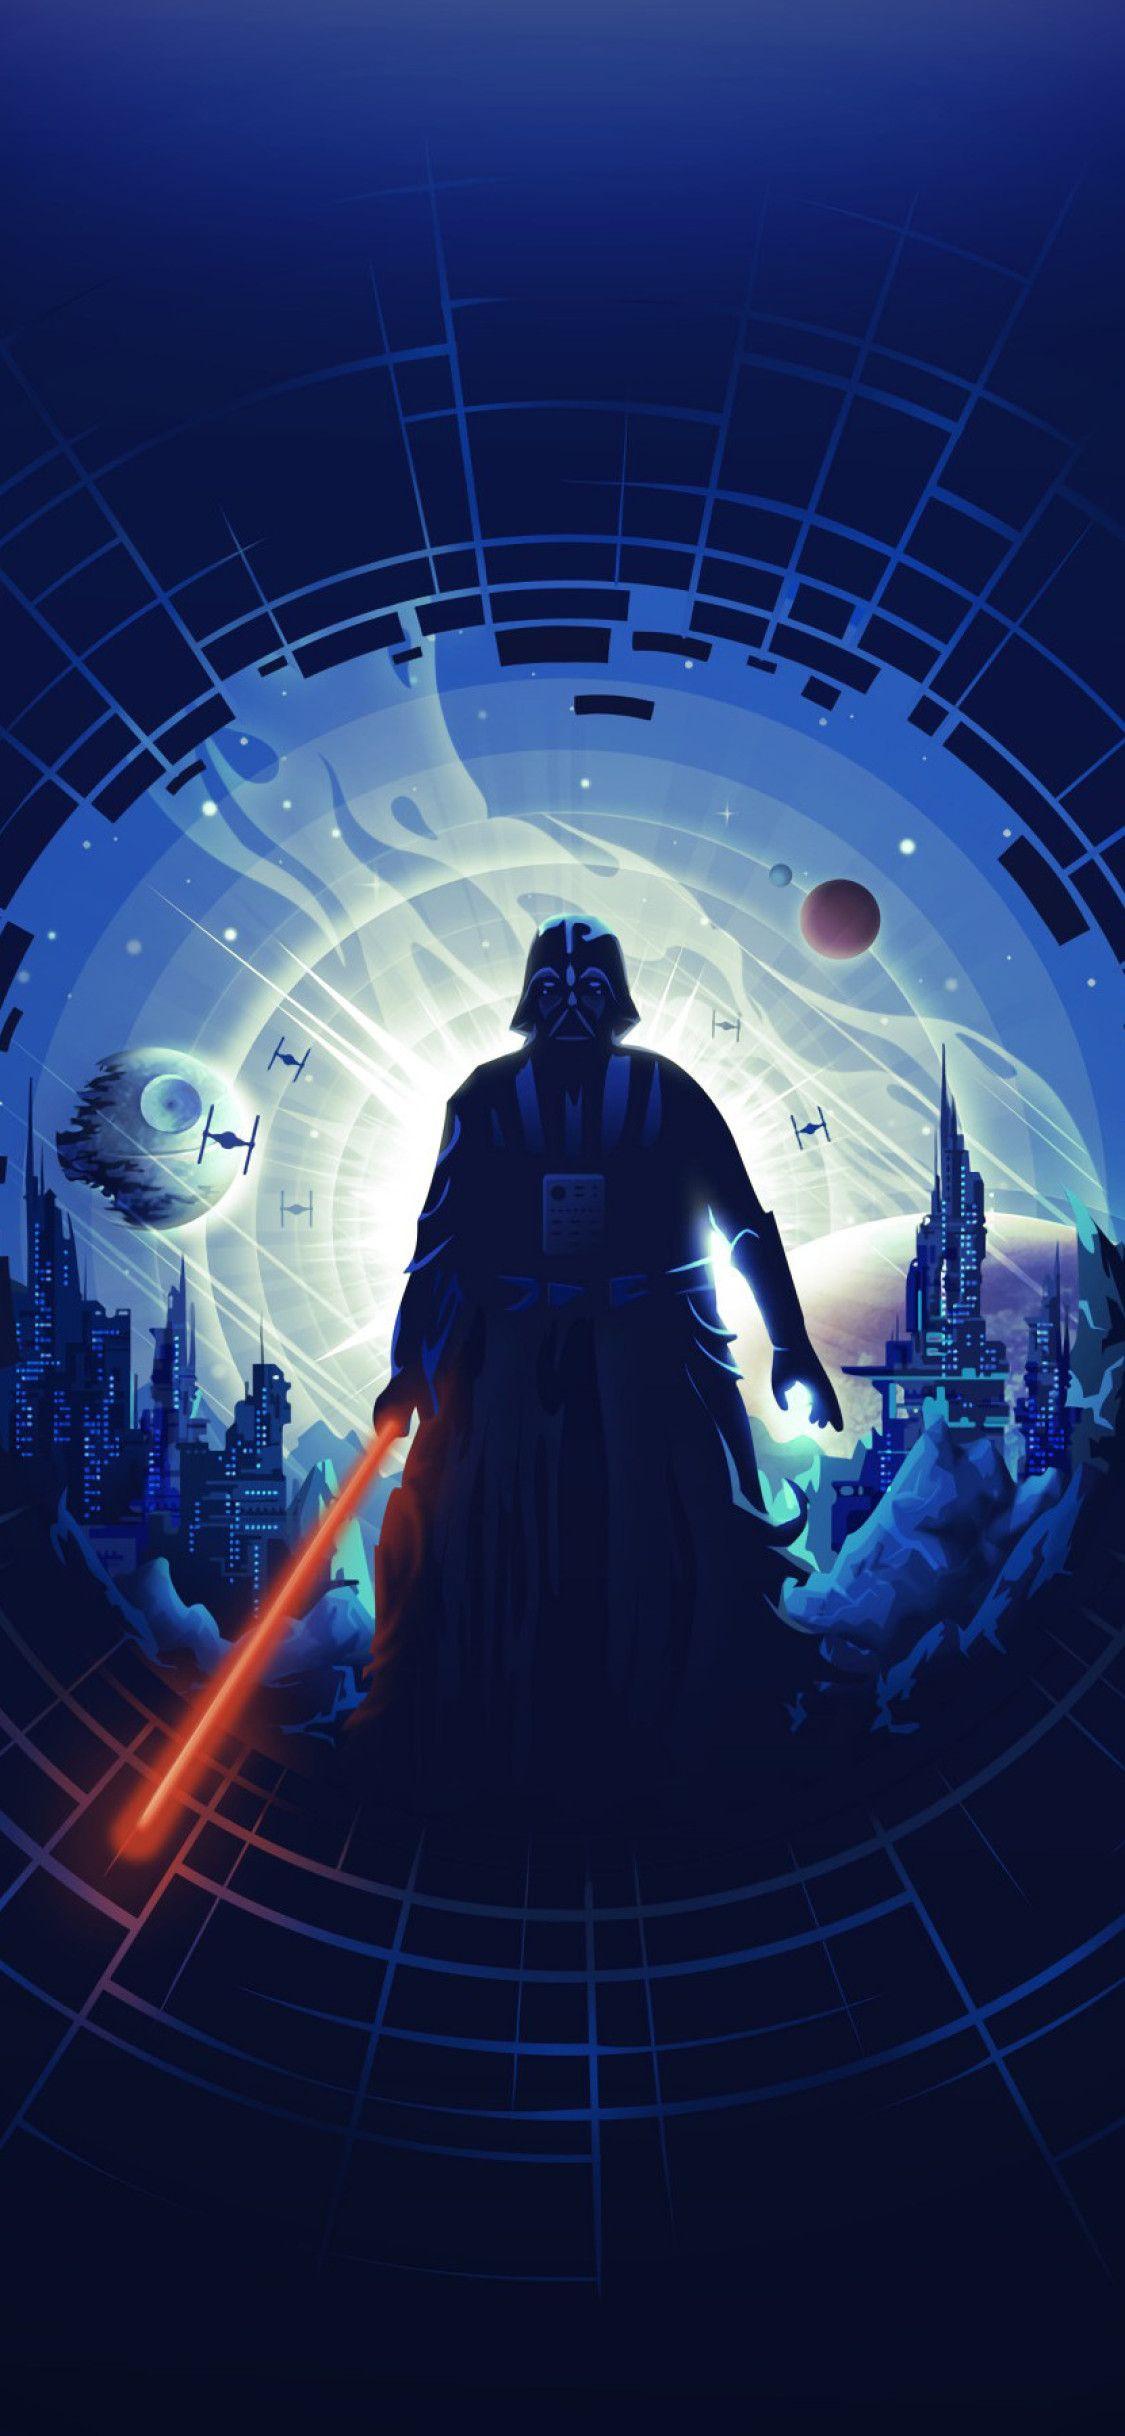 Star Wars 4k Iphone Wallpapers Wallpaper Cave